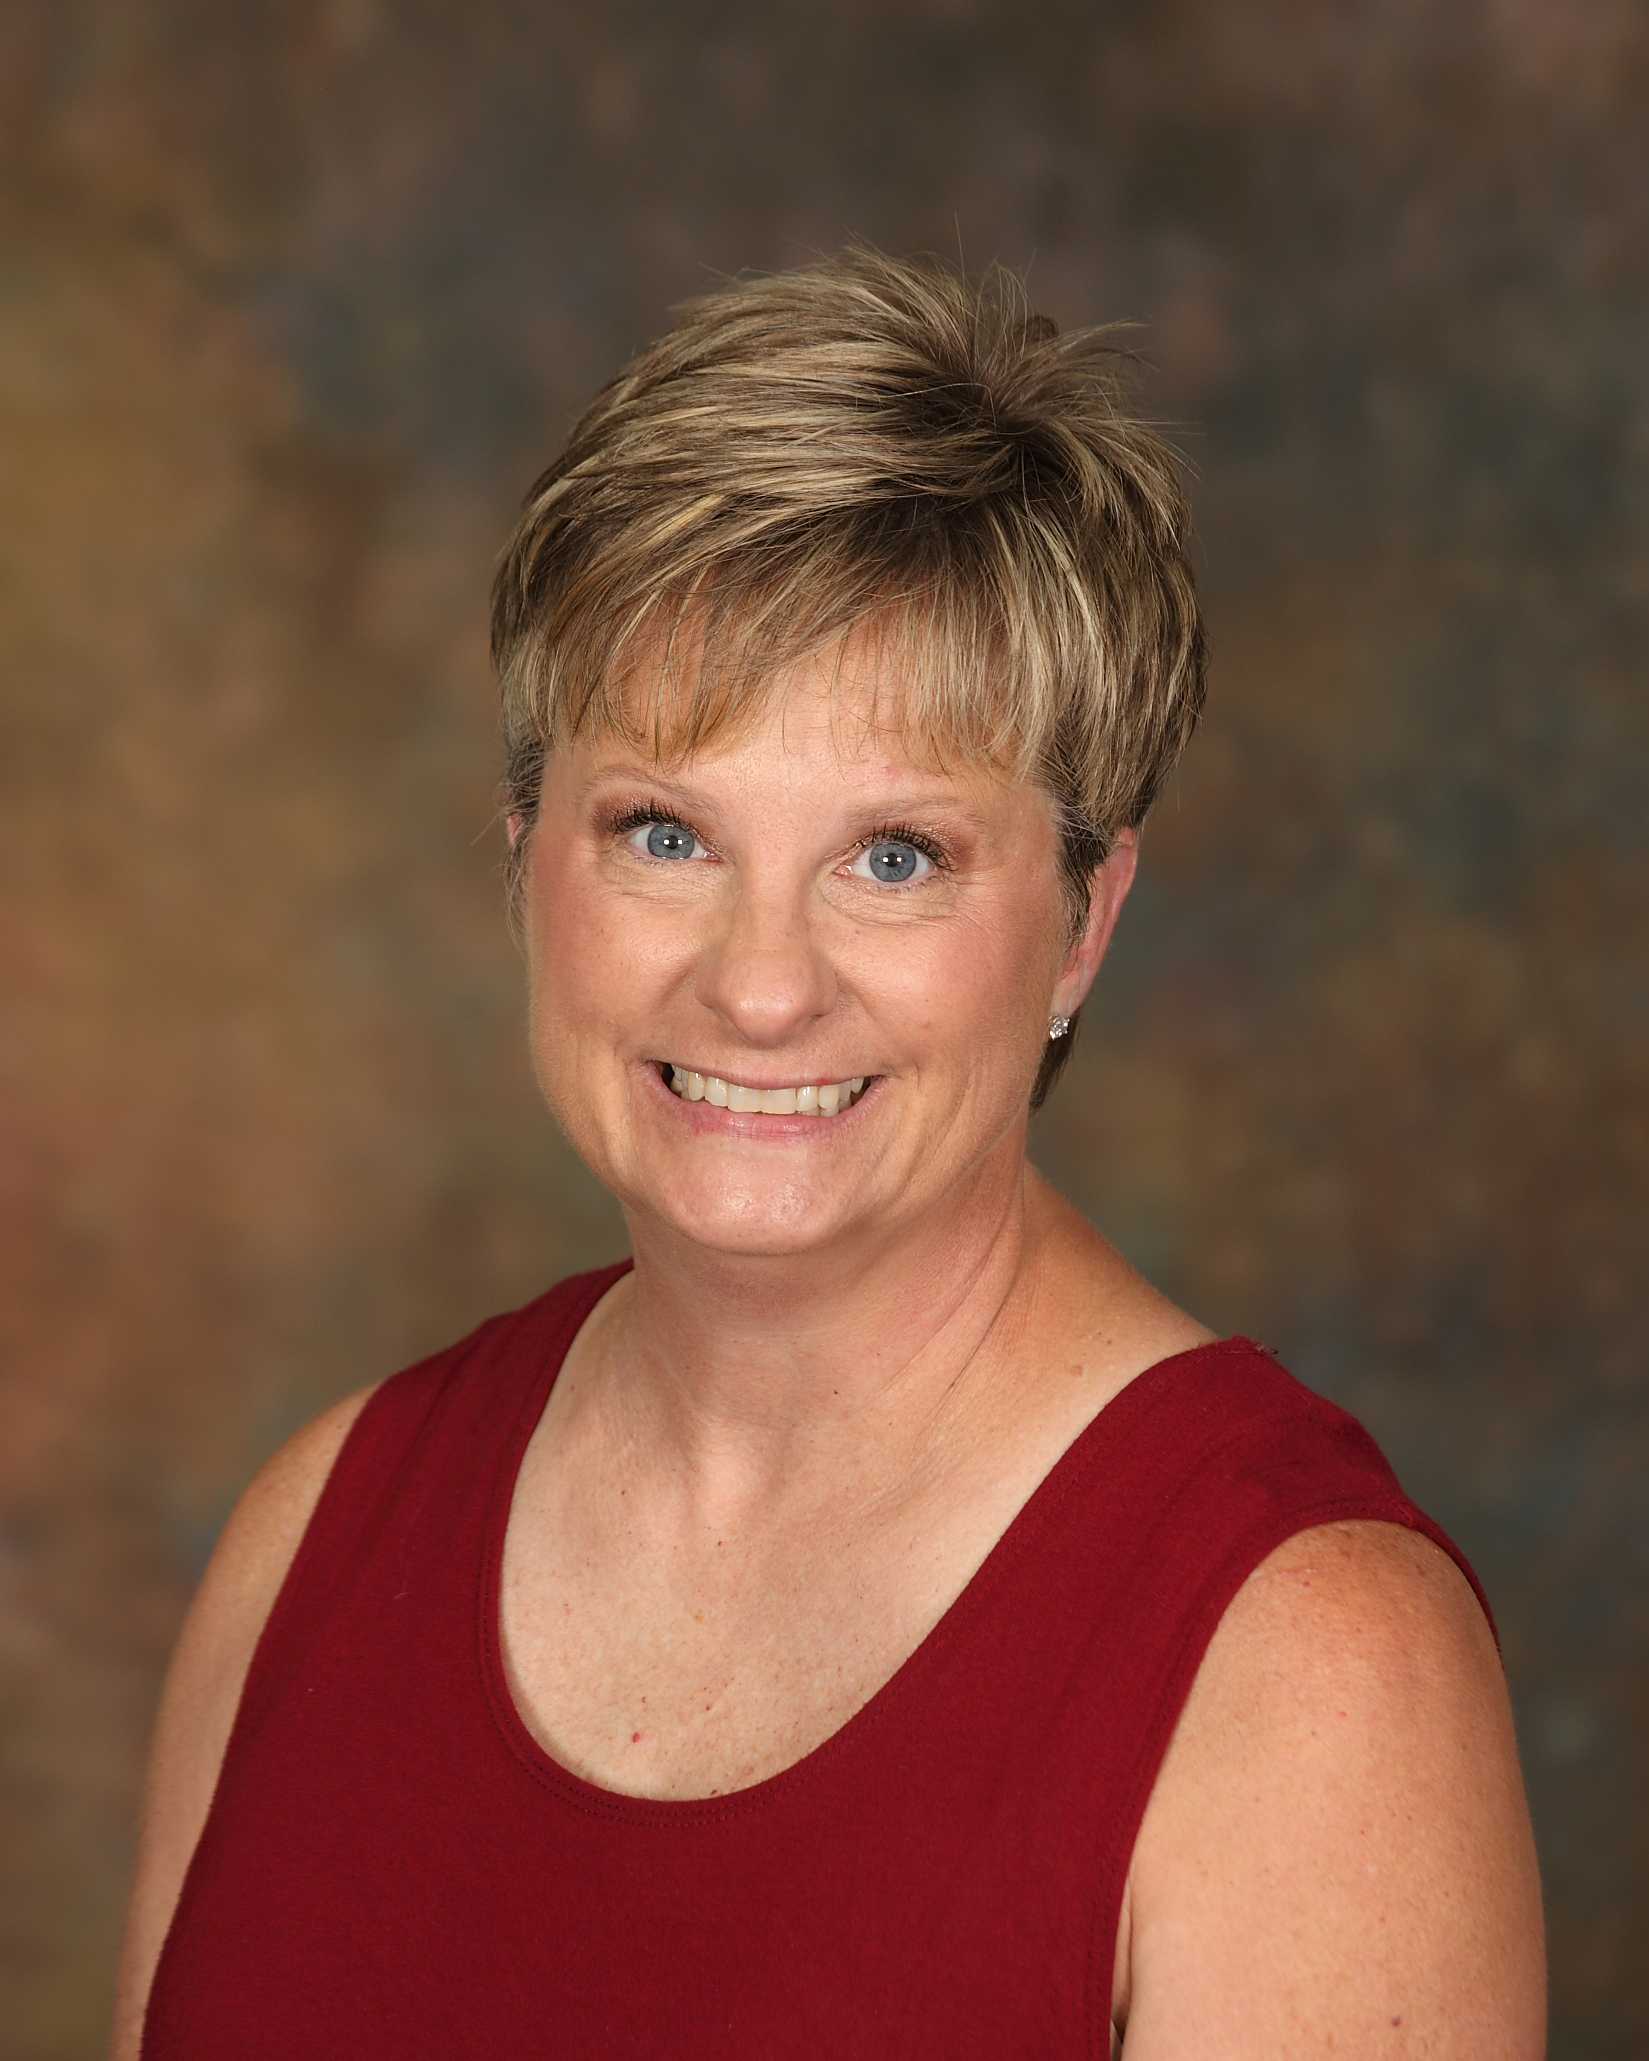 Lori Gribble